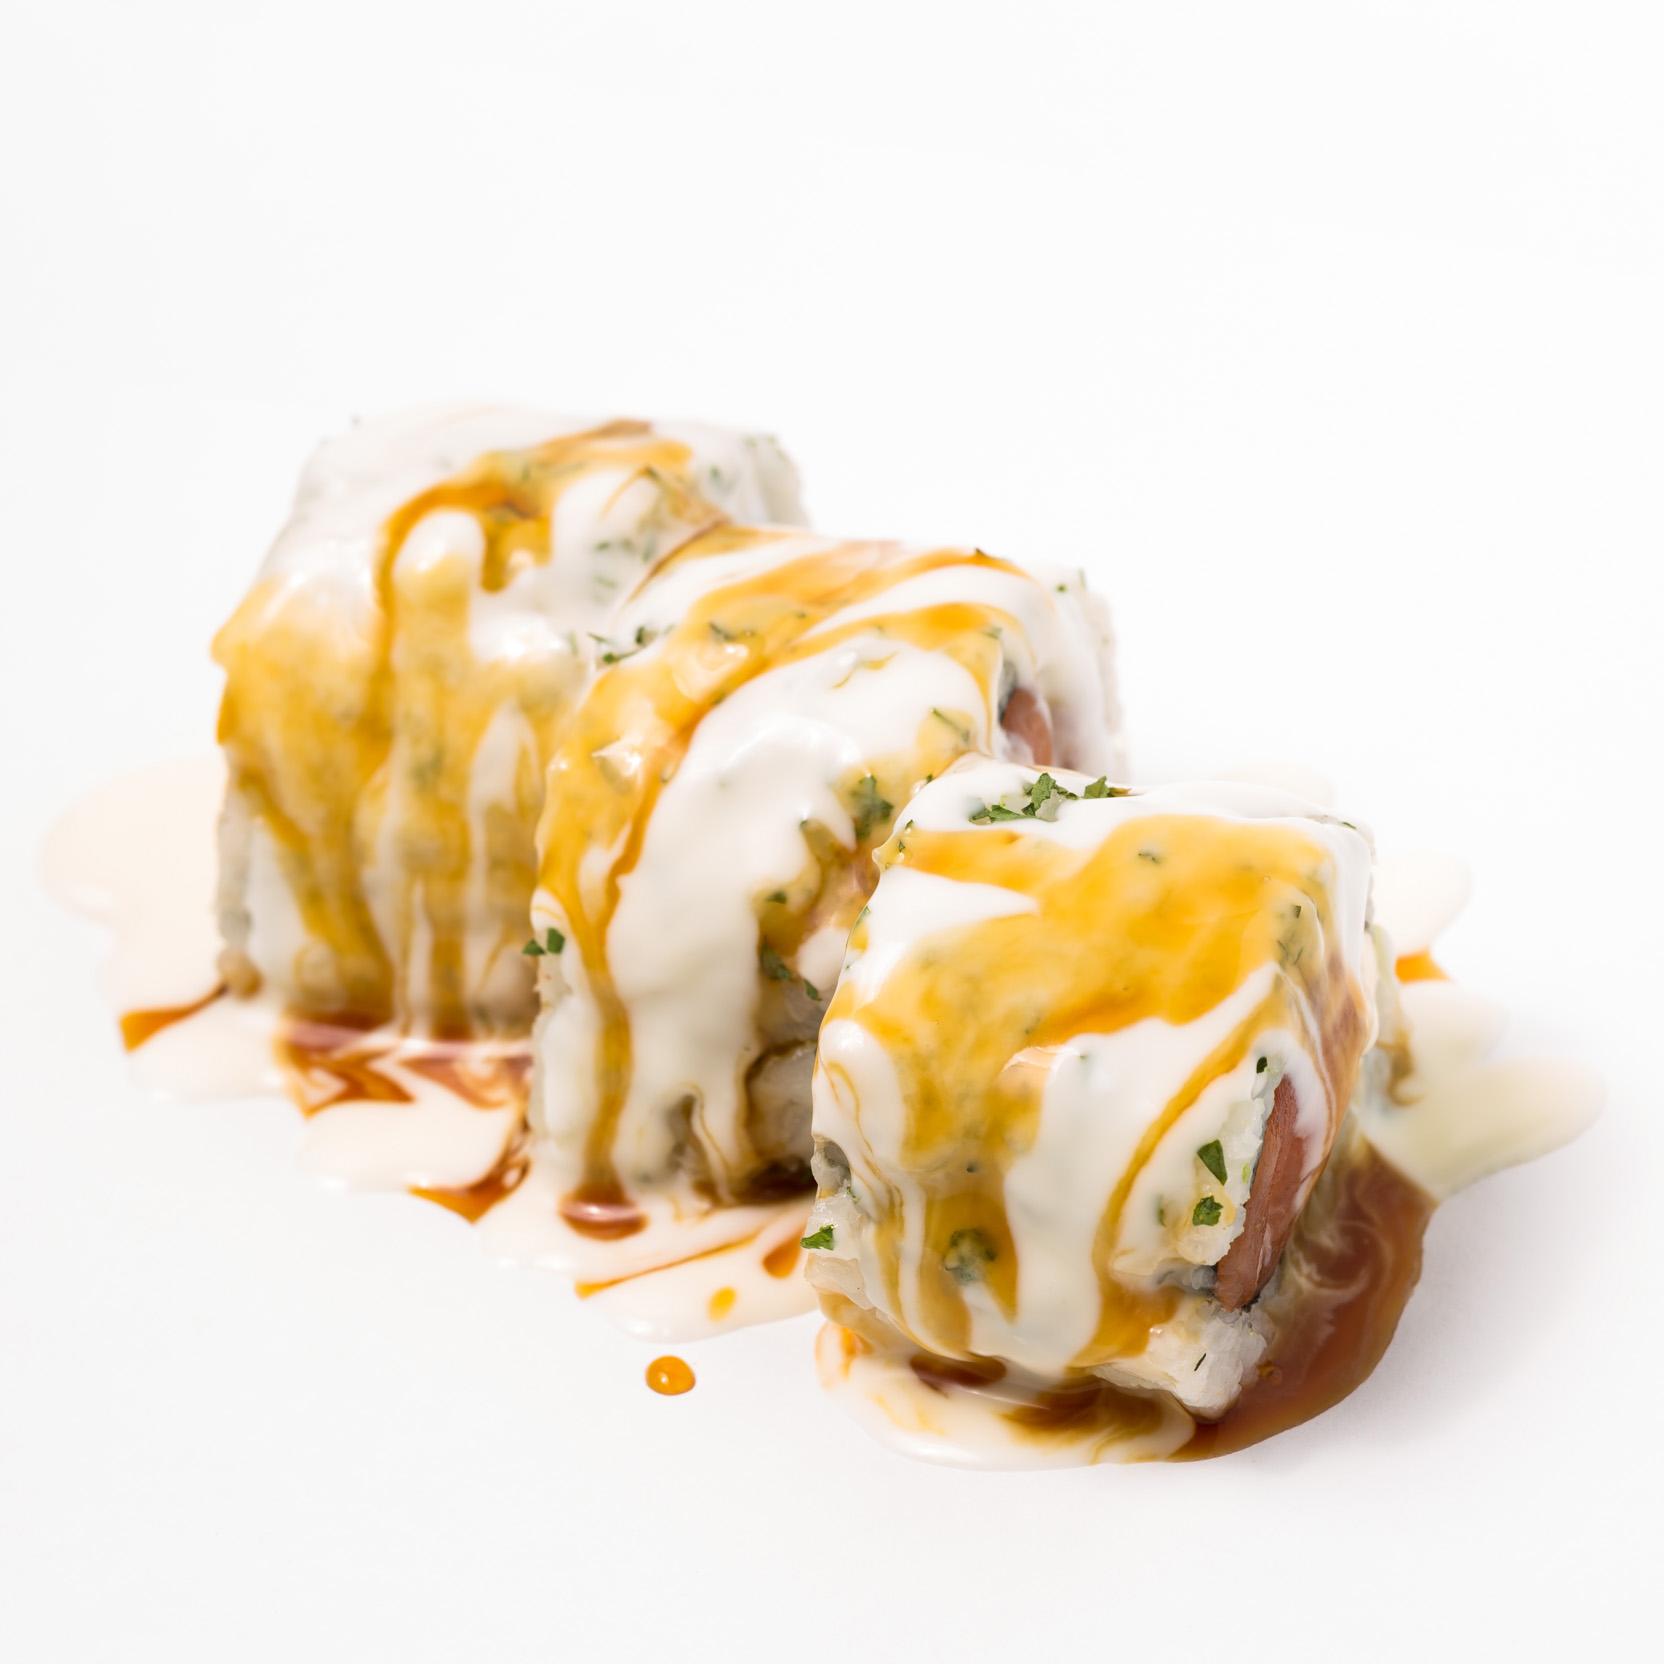 Salmon & Creem Cheese Roll